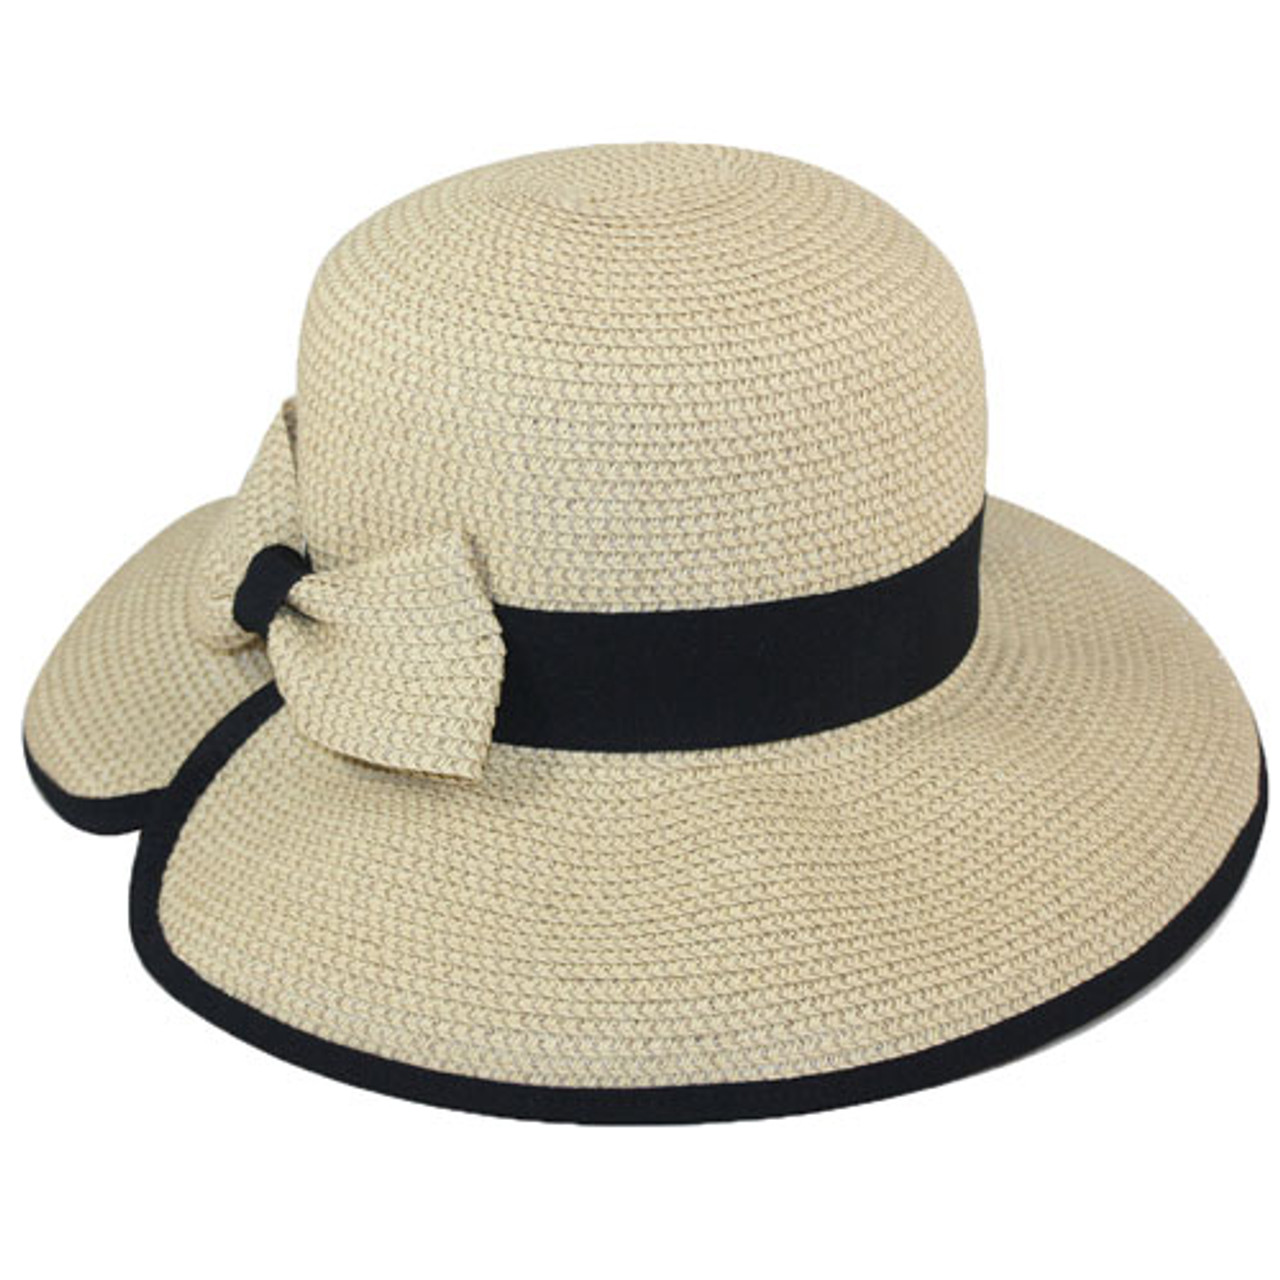 Jeanne Simmons. Jeanne Simmons - Split Brim Sun Hat 5bfc14c34a9